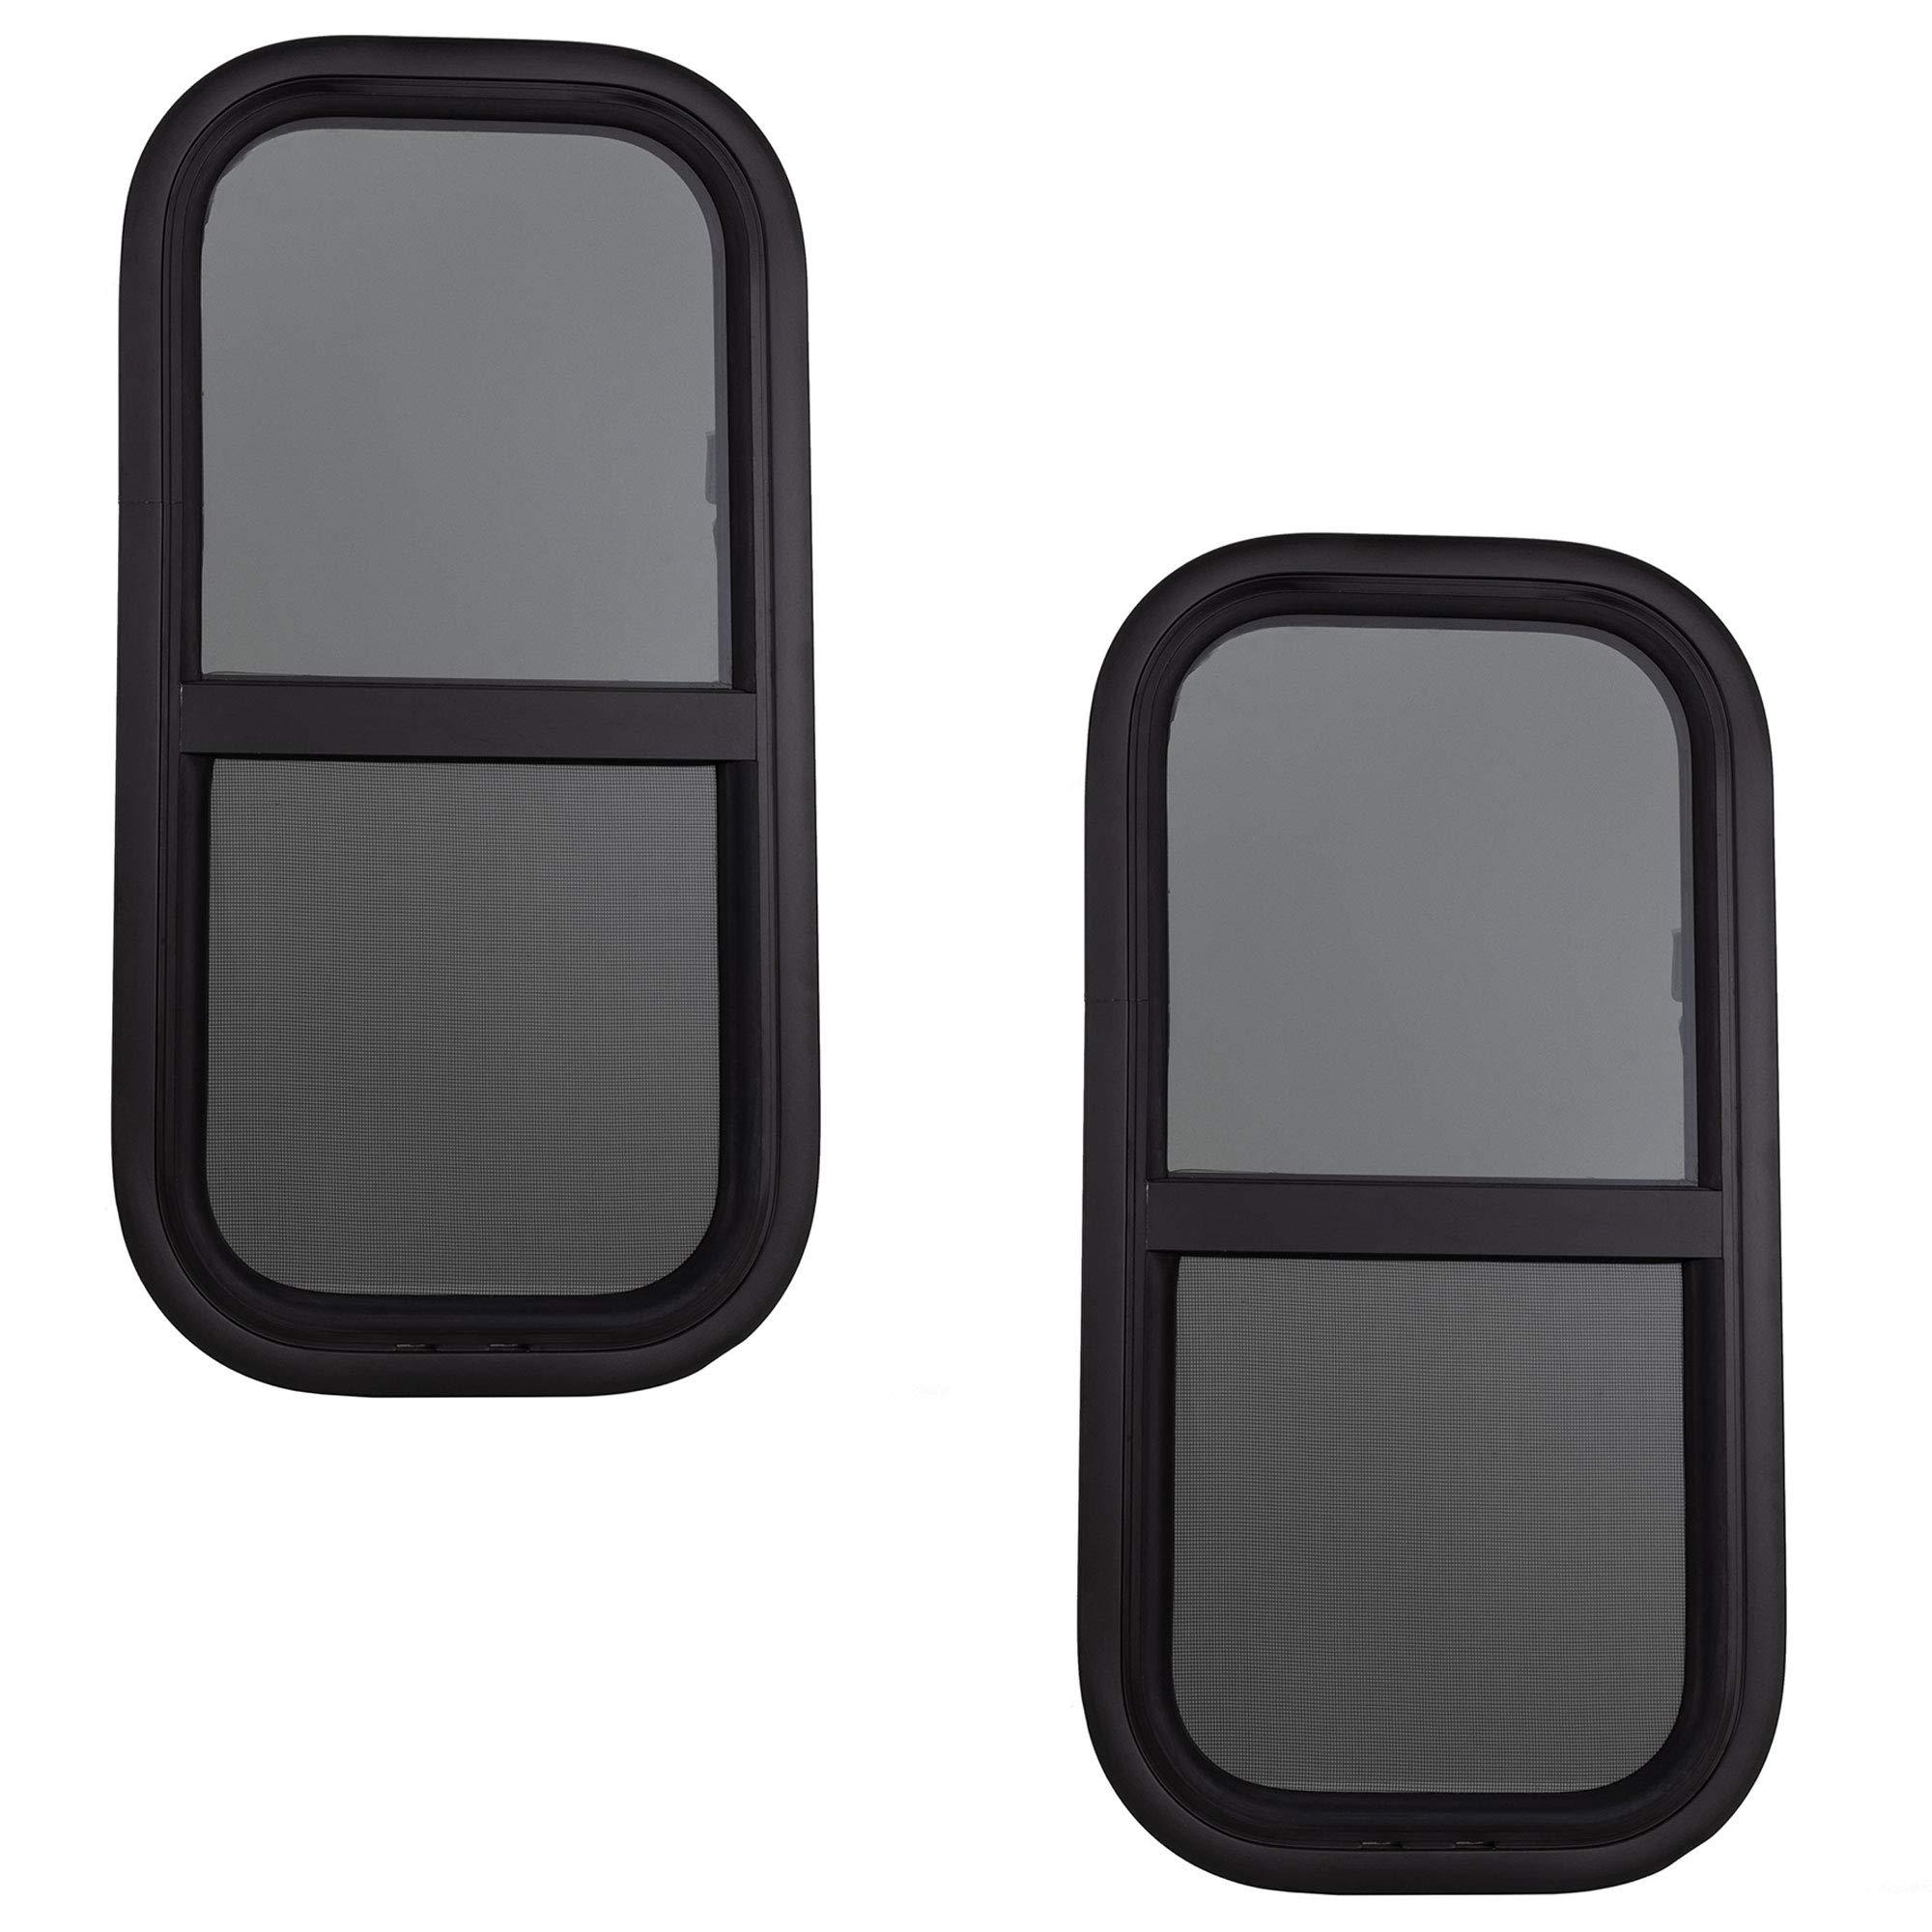 "RV Window | Teardrop 12"" W x 24"" H Vertical Slide | 1 1/2"" Wall Thickness | RV Window Replacement (2 Windows, with Trim Kit)"